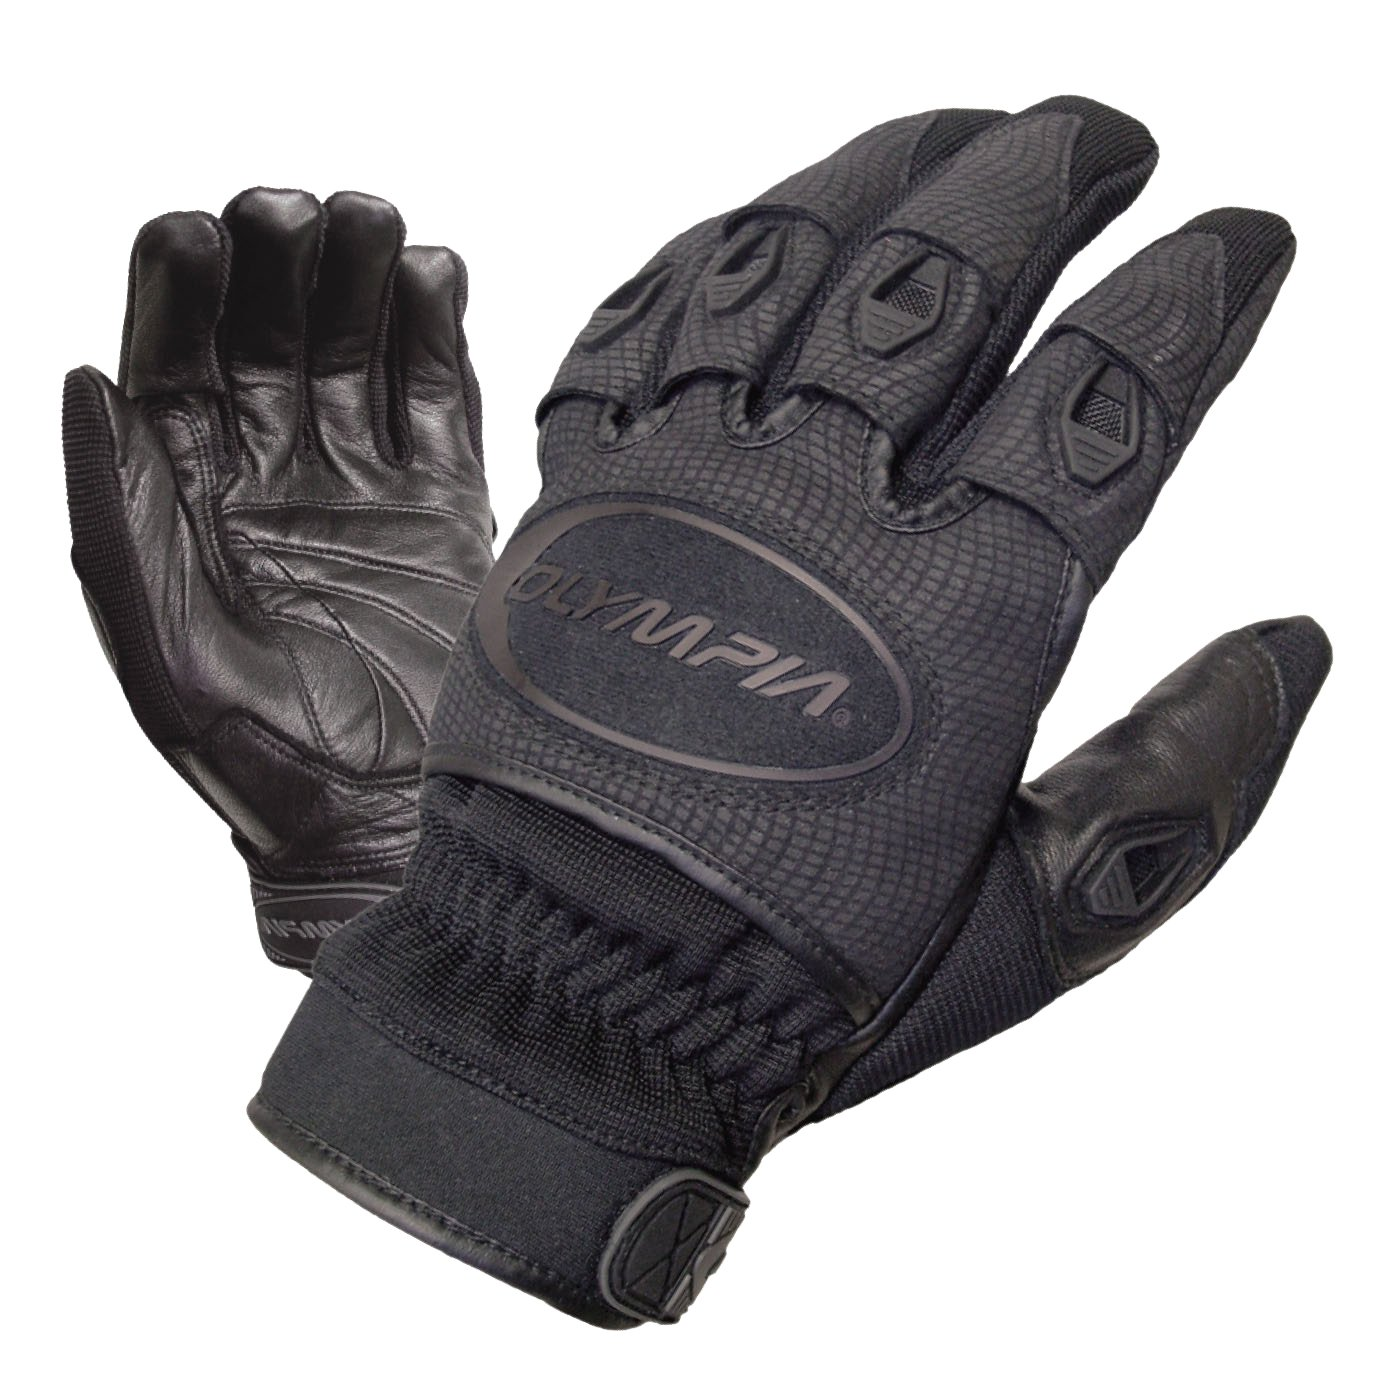 Olympia Sports Men's Ventor Gloves (Black, Small)